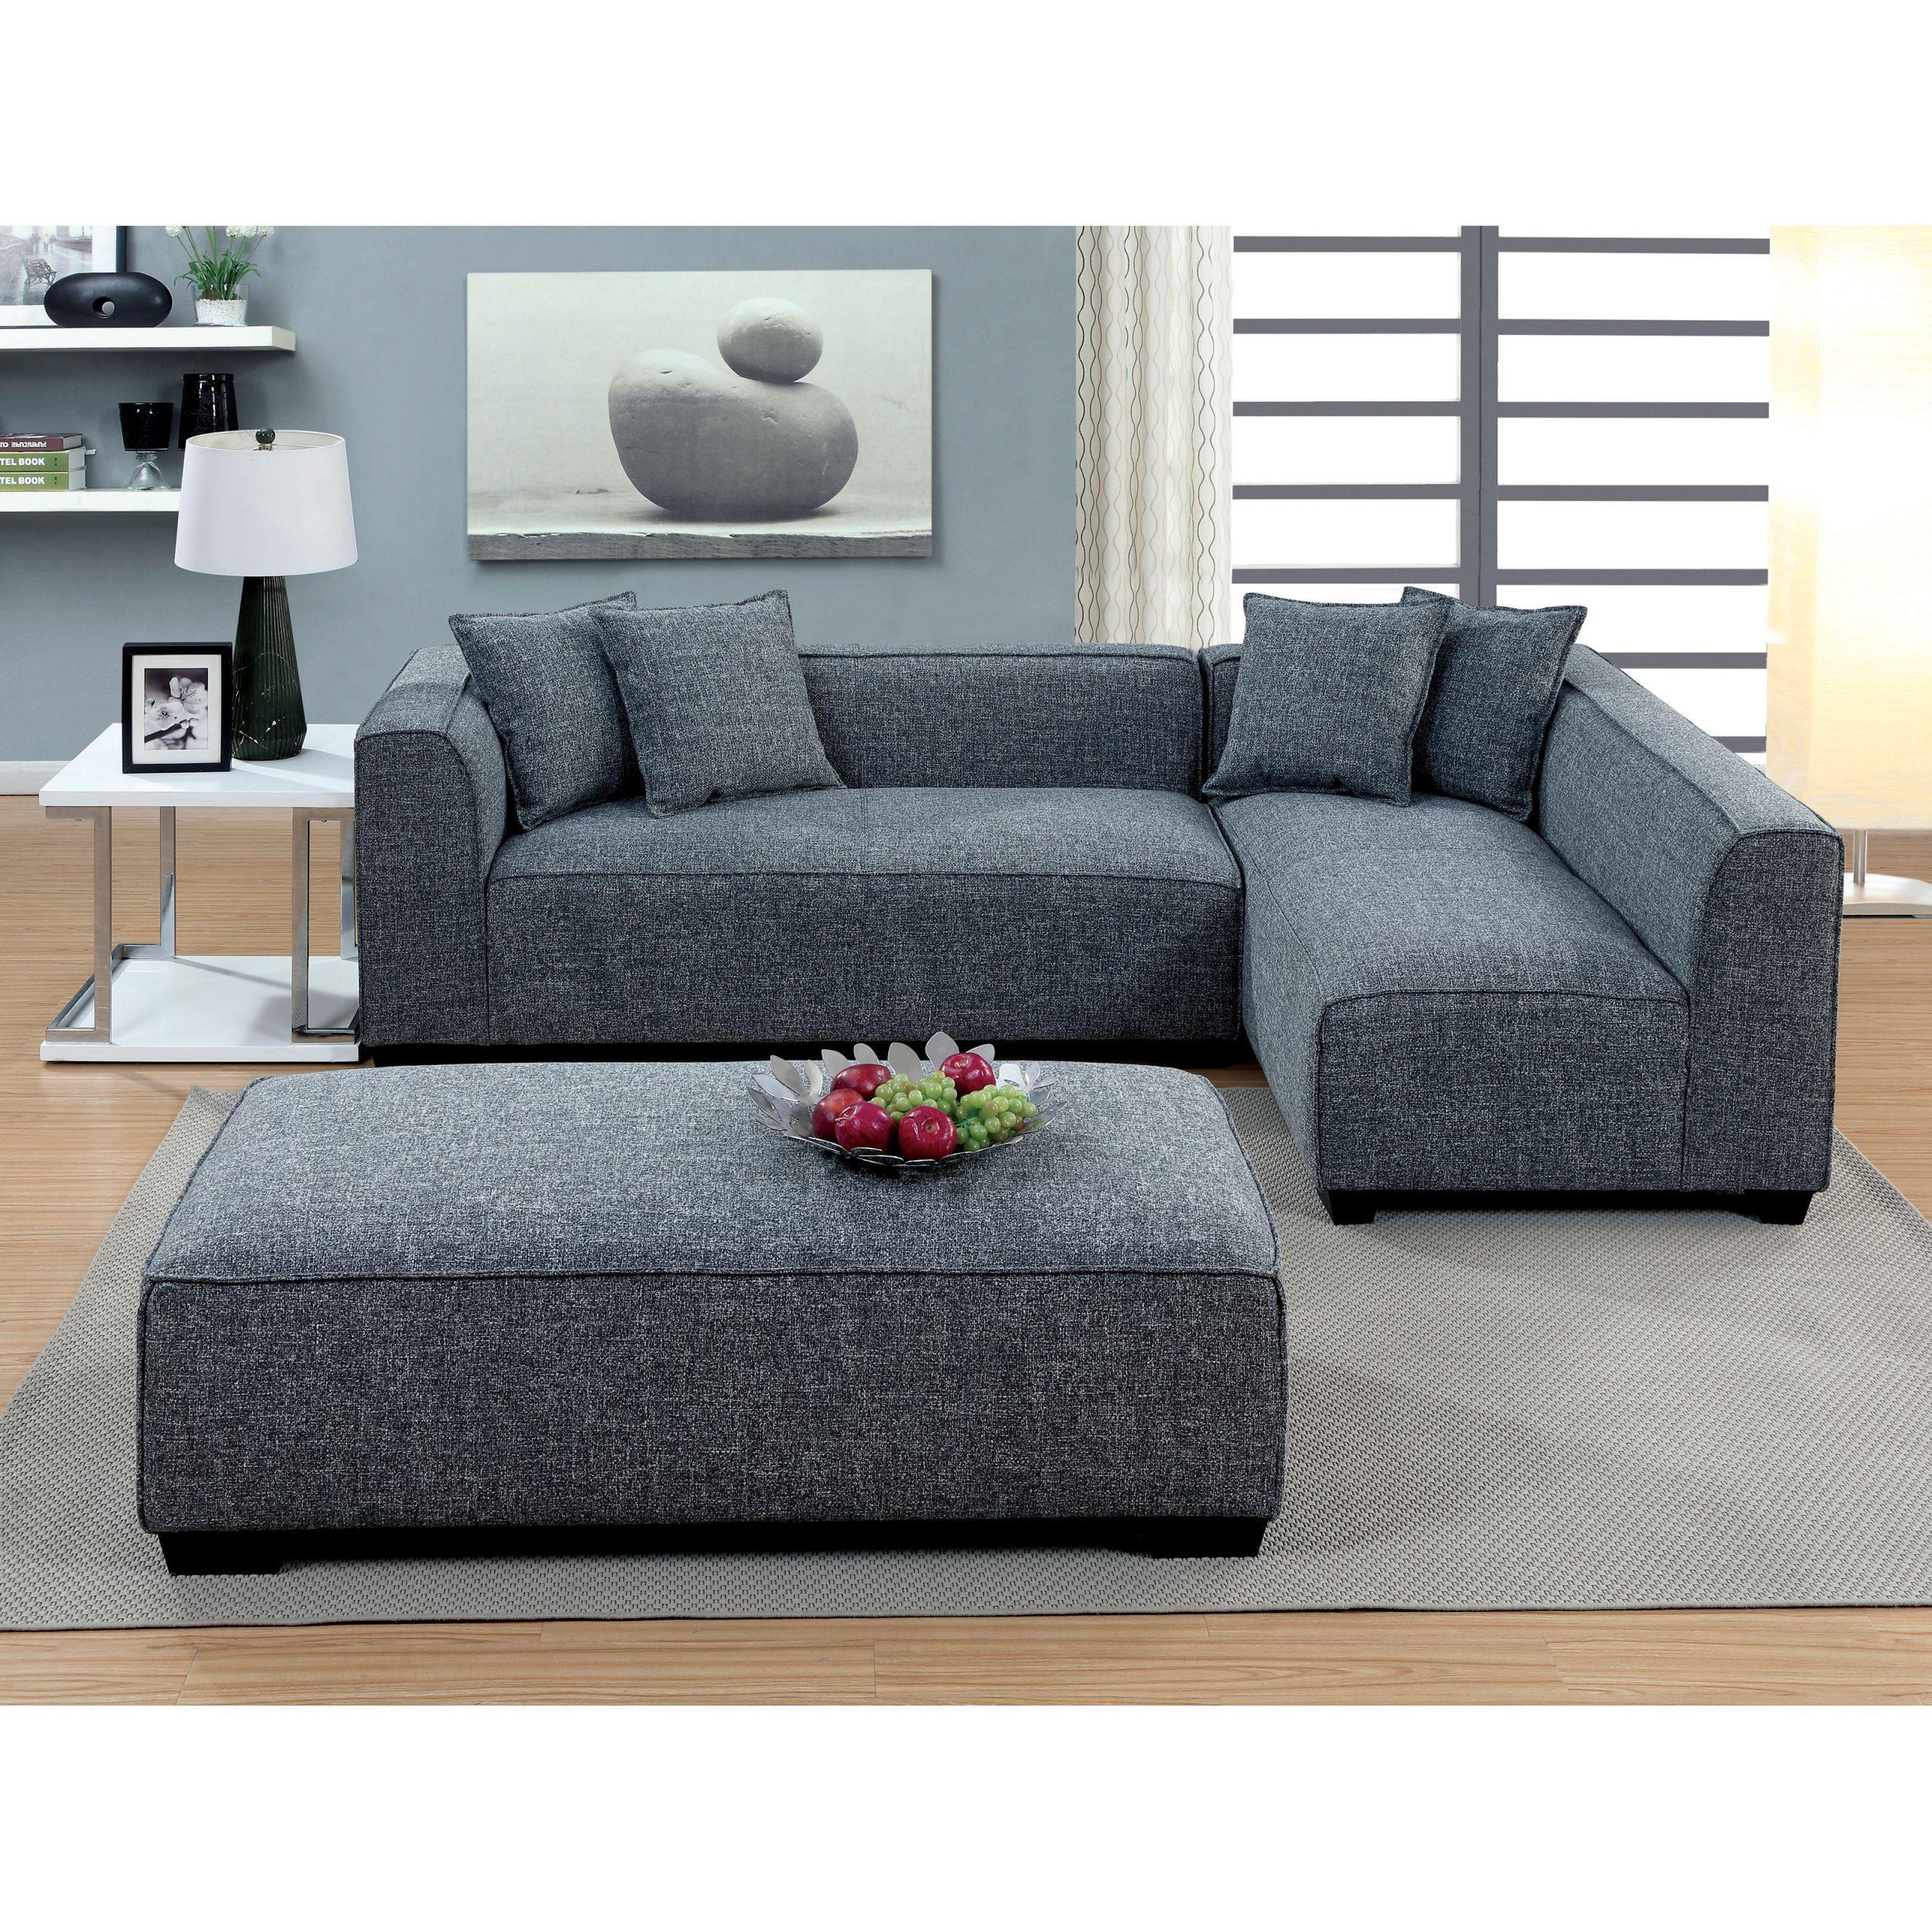 Plush Sectional Sofa Furniture Of America Misha Regarding 2Pc Luxurious And Plush Corduroy Sectional Sofas Brown (View 3 of 15)